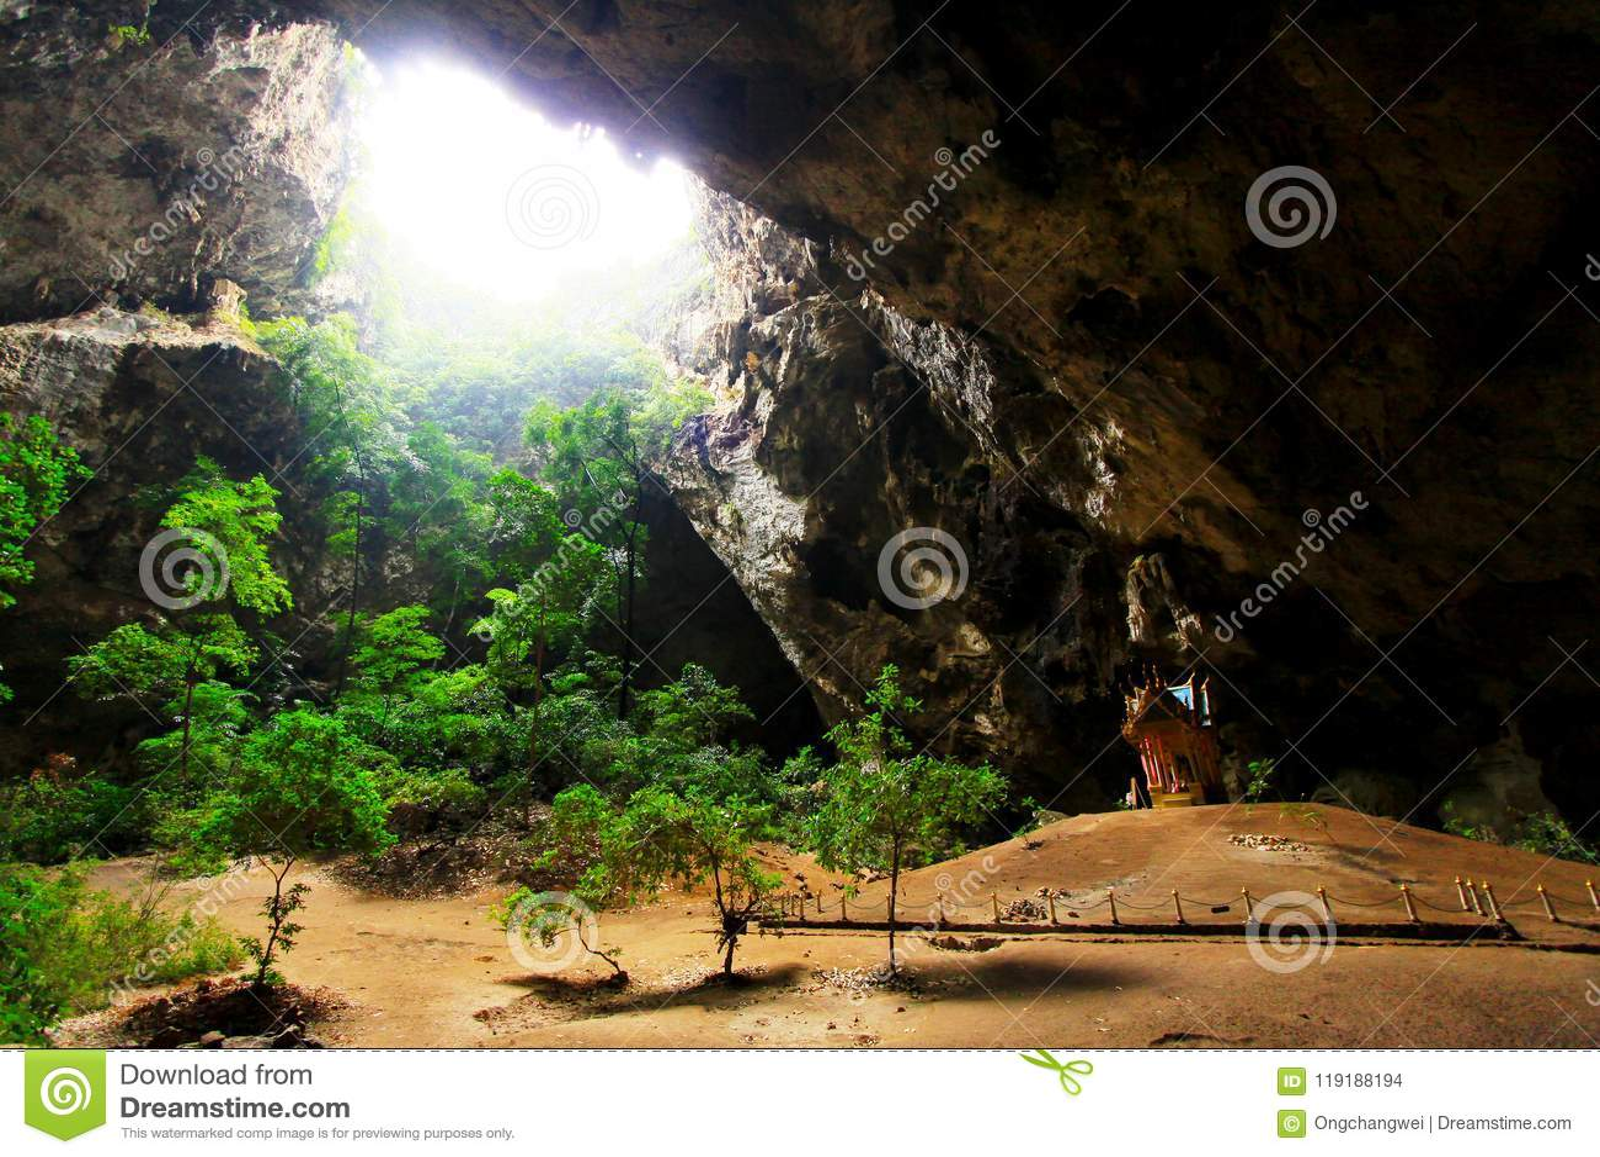 Caverne de Phraya Nakhon, Khao Sam Roi Yot National Park, Thaïlande